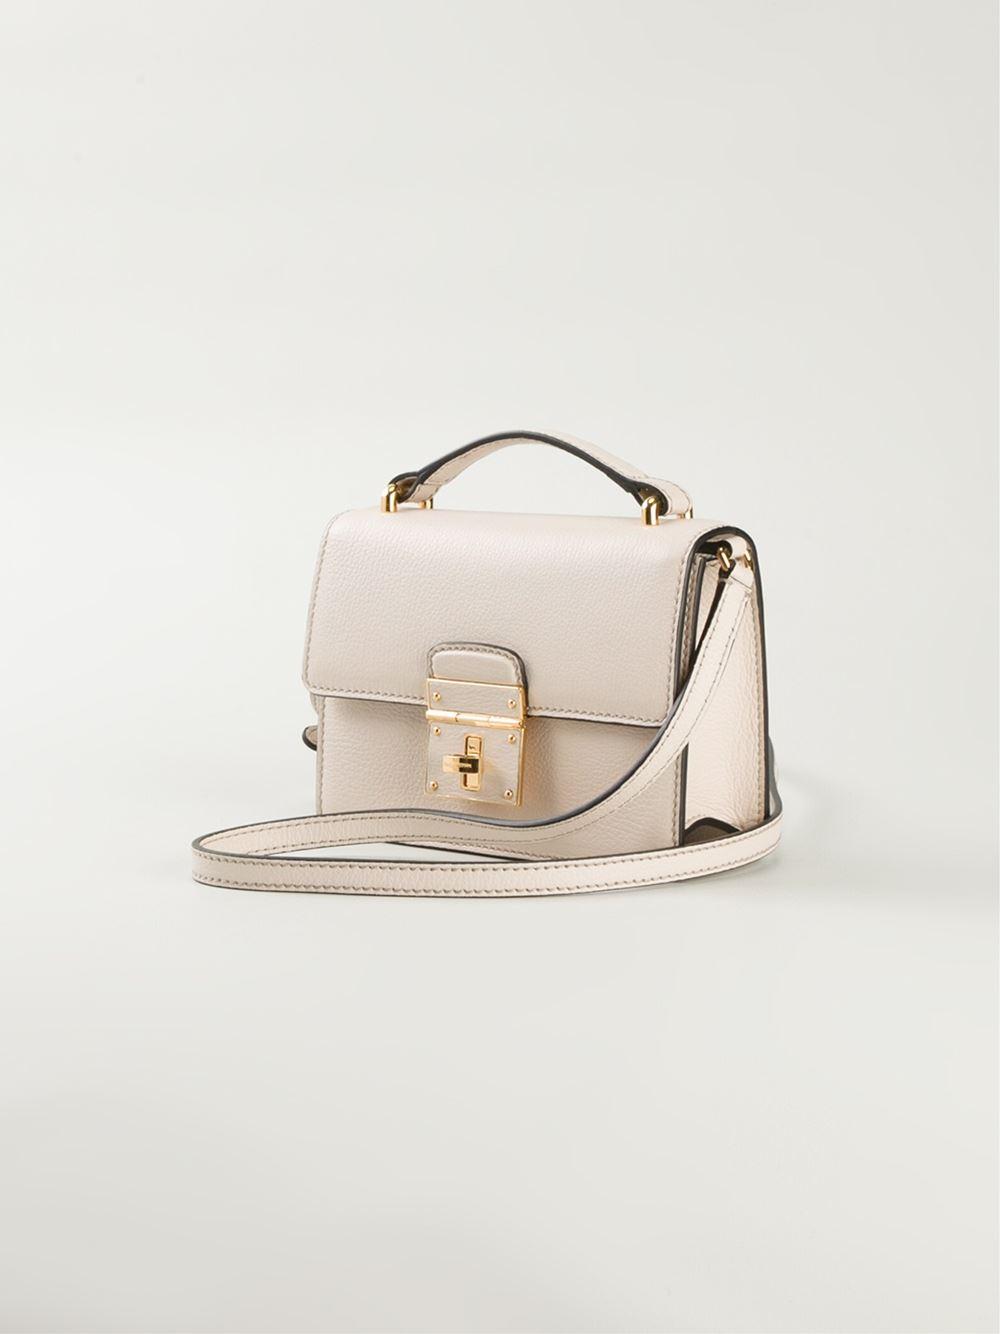 e142f2fc6c8a Lyst - Dolce   Gabbana Rosalia Leather Shoulder Bag in Natural